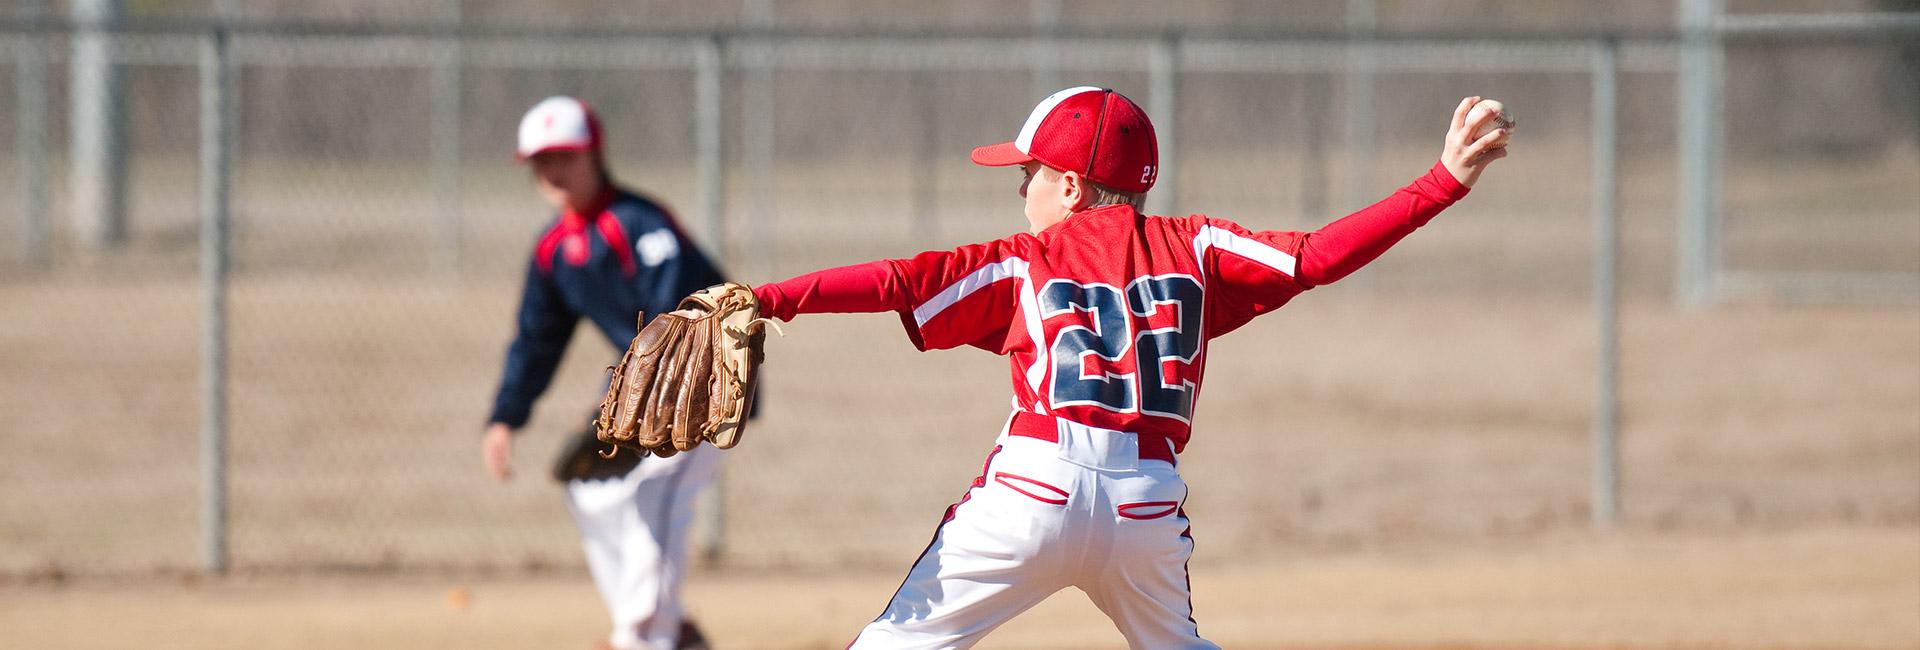 Dynamic Warmup Baseball